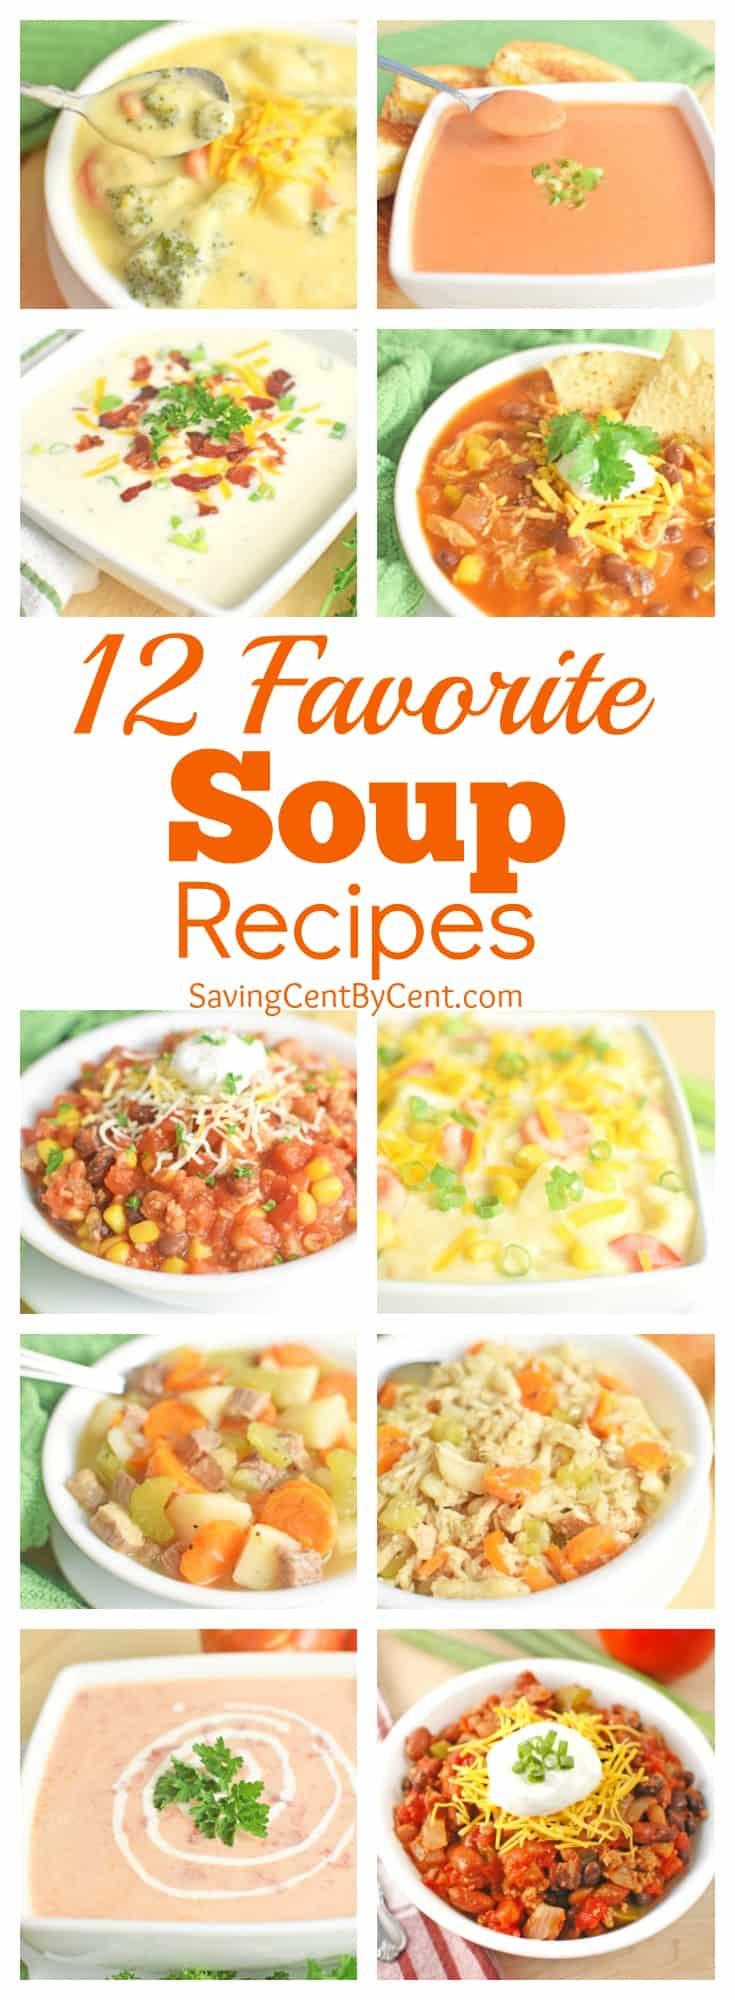 12 favorite soup recipes